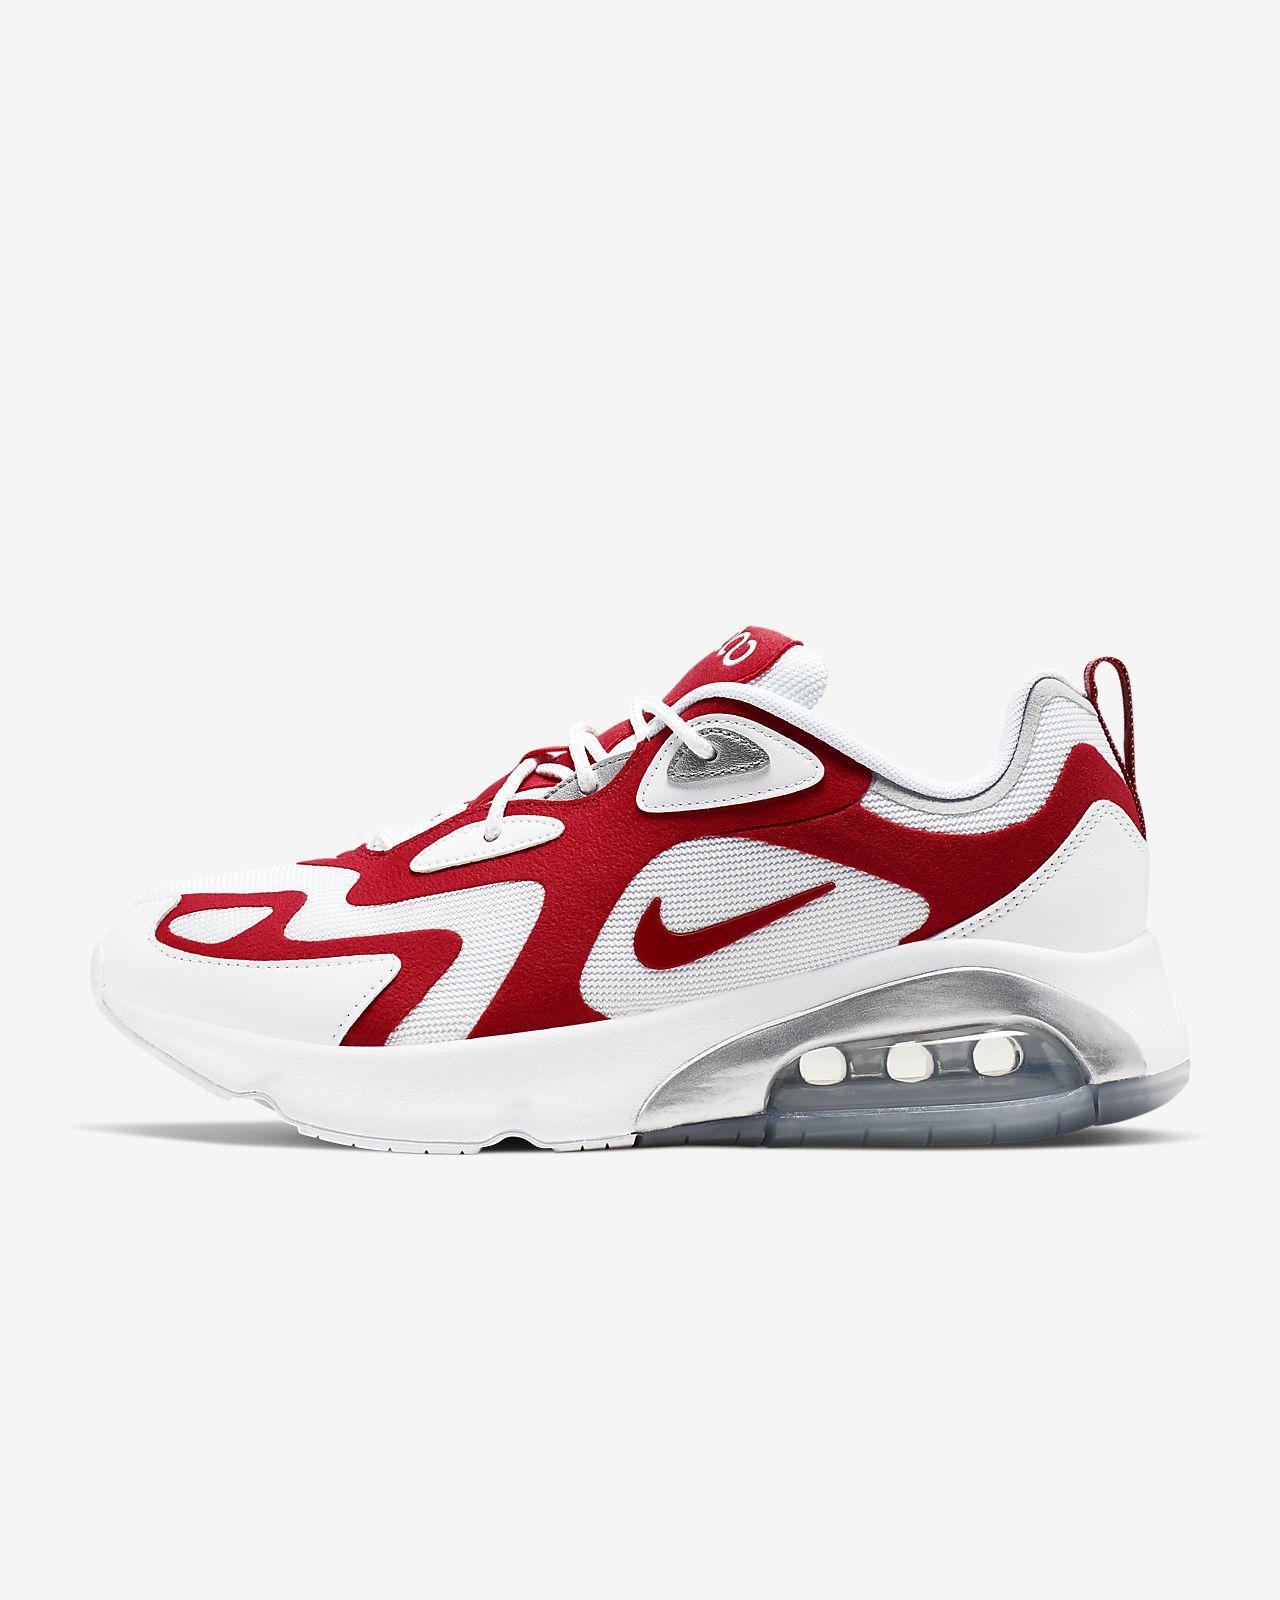 Nike Air Max 200 Men's Shoe. Nike ZA